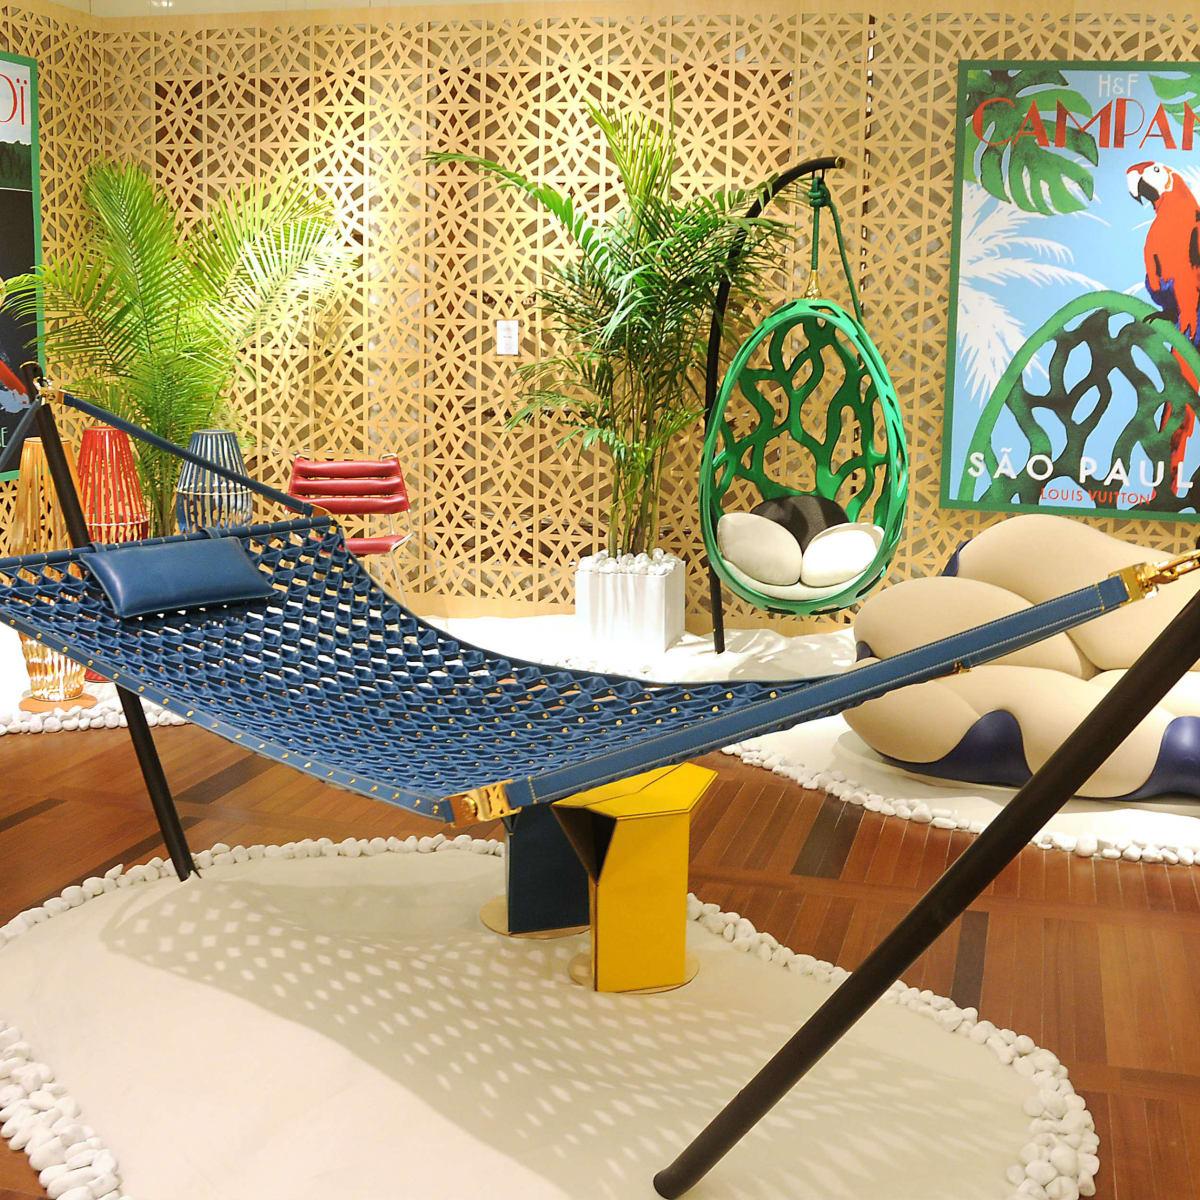 Louis Vutton's Objets Nomades hammock interior